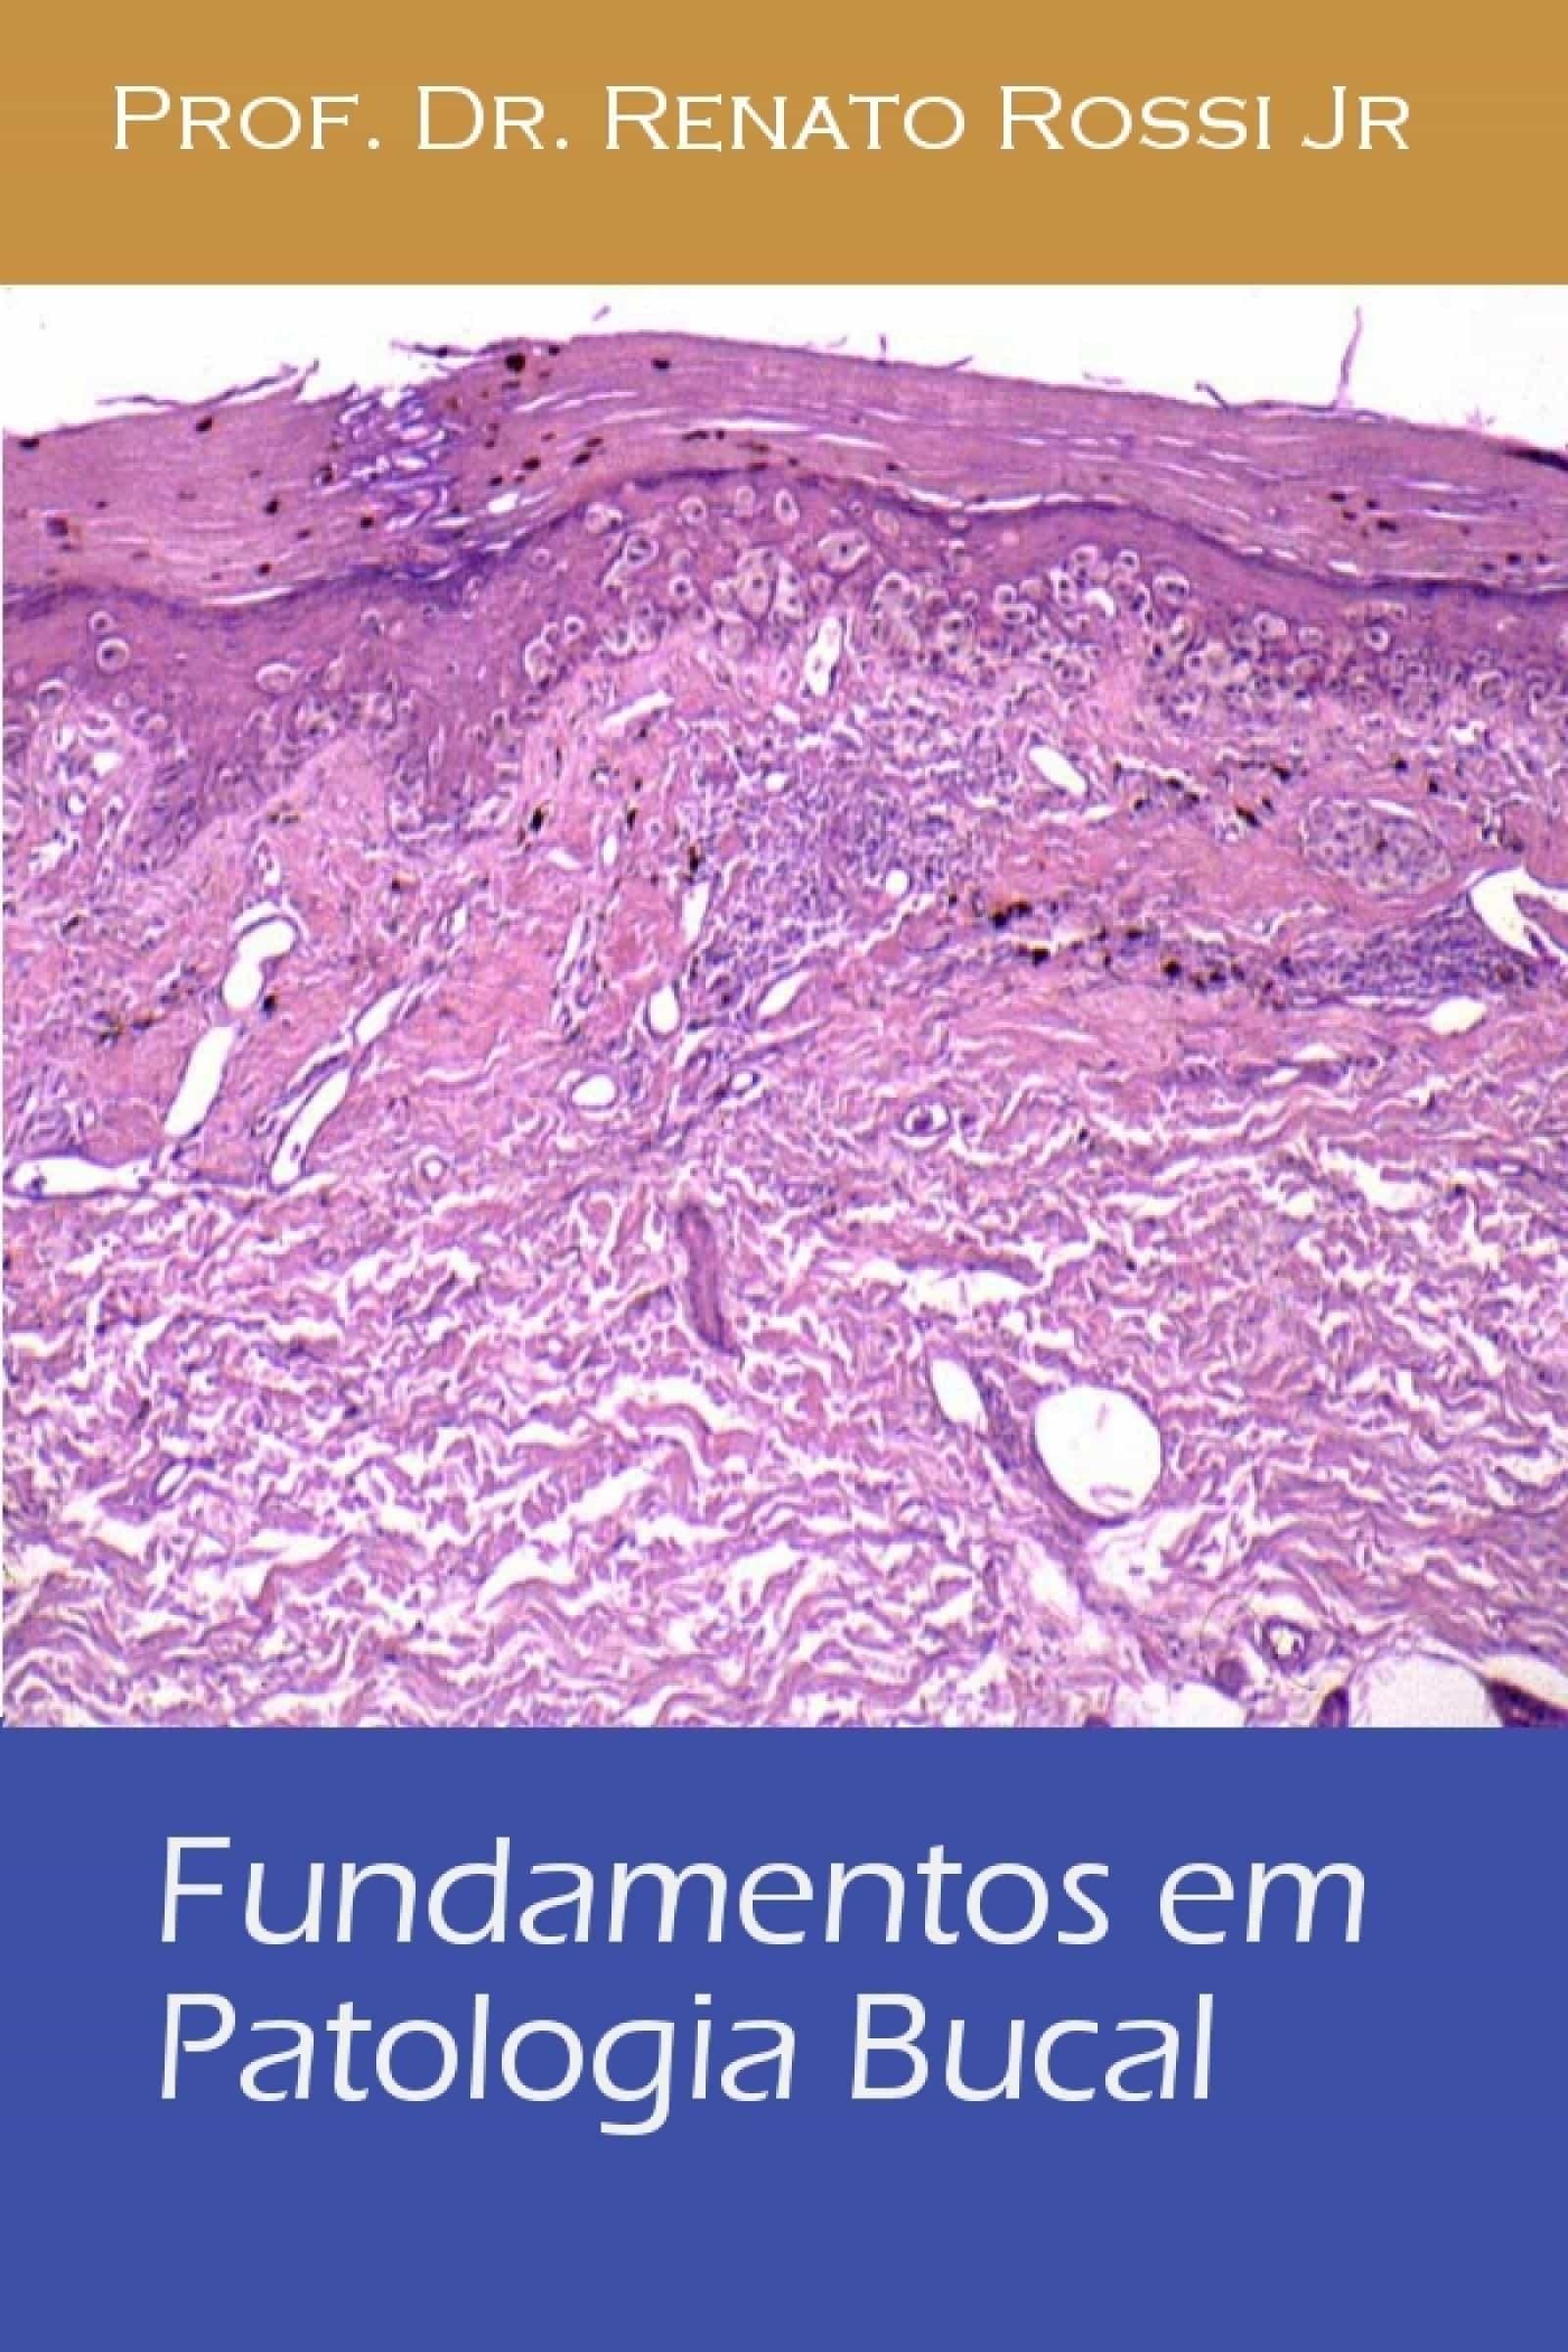 FUNDAMENTOS EM PATOLOGIA BUCAL EBOOK | RENATO ROSSI | Descargar ...